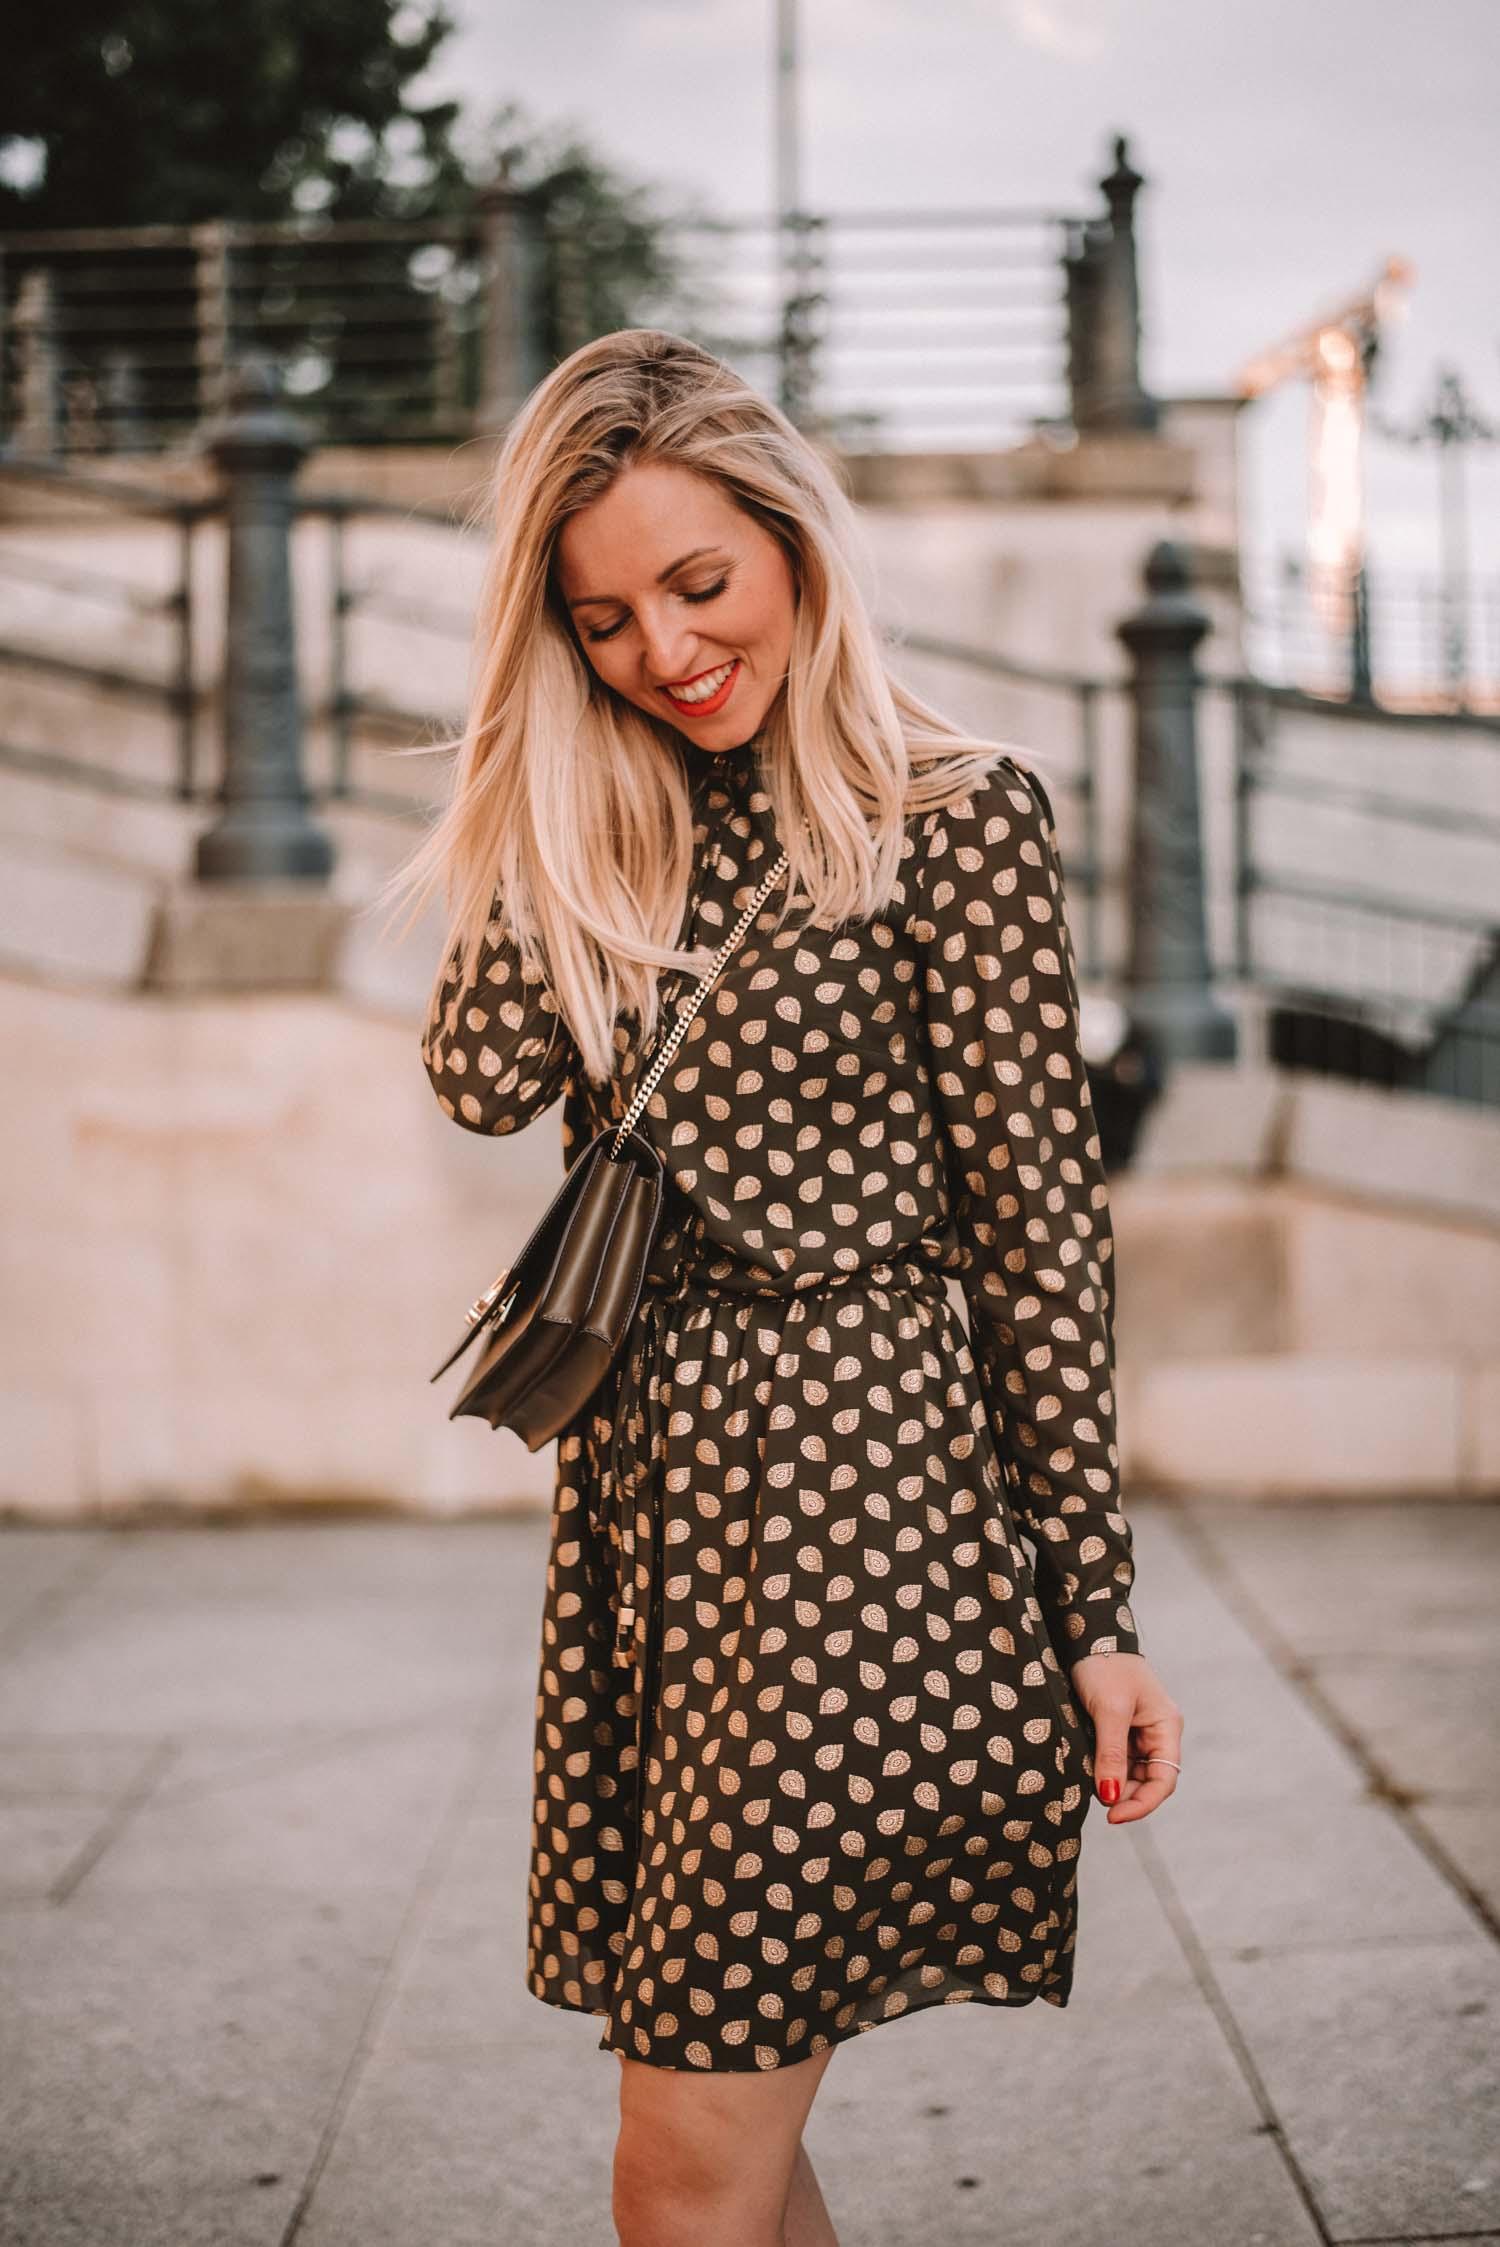 Berlin Fashion Week Outfit 2018